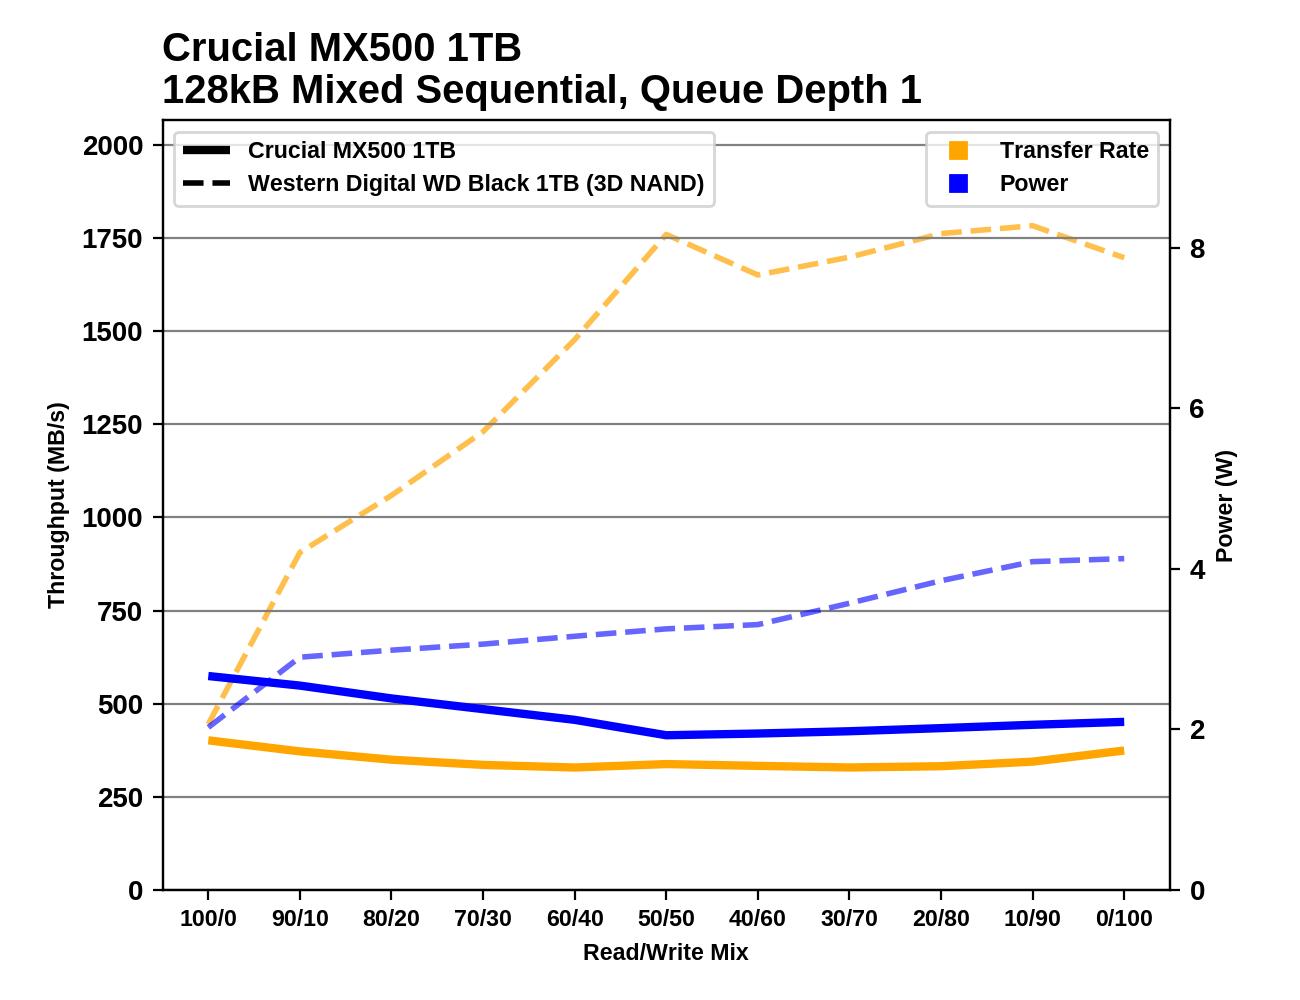 Обзор Western Digital WD Black 3D NAND SSD: EVO встретил равного - 143